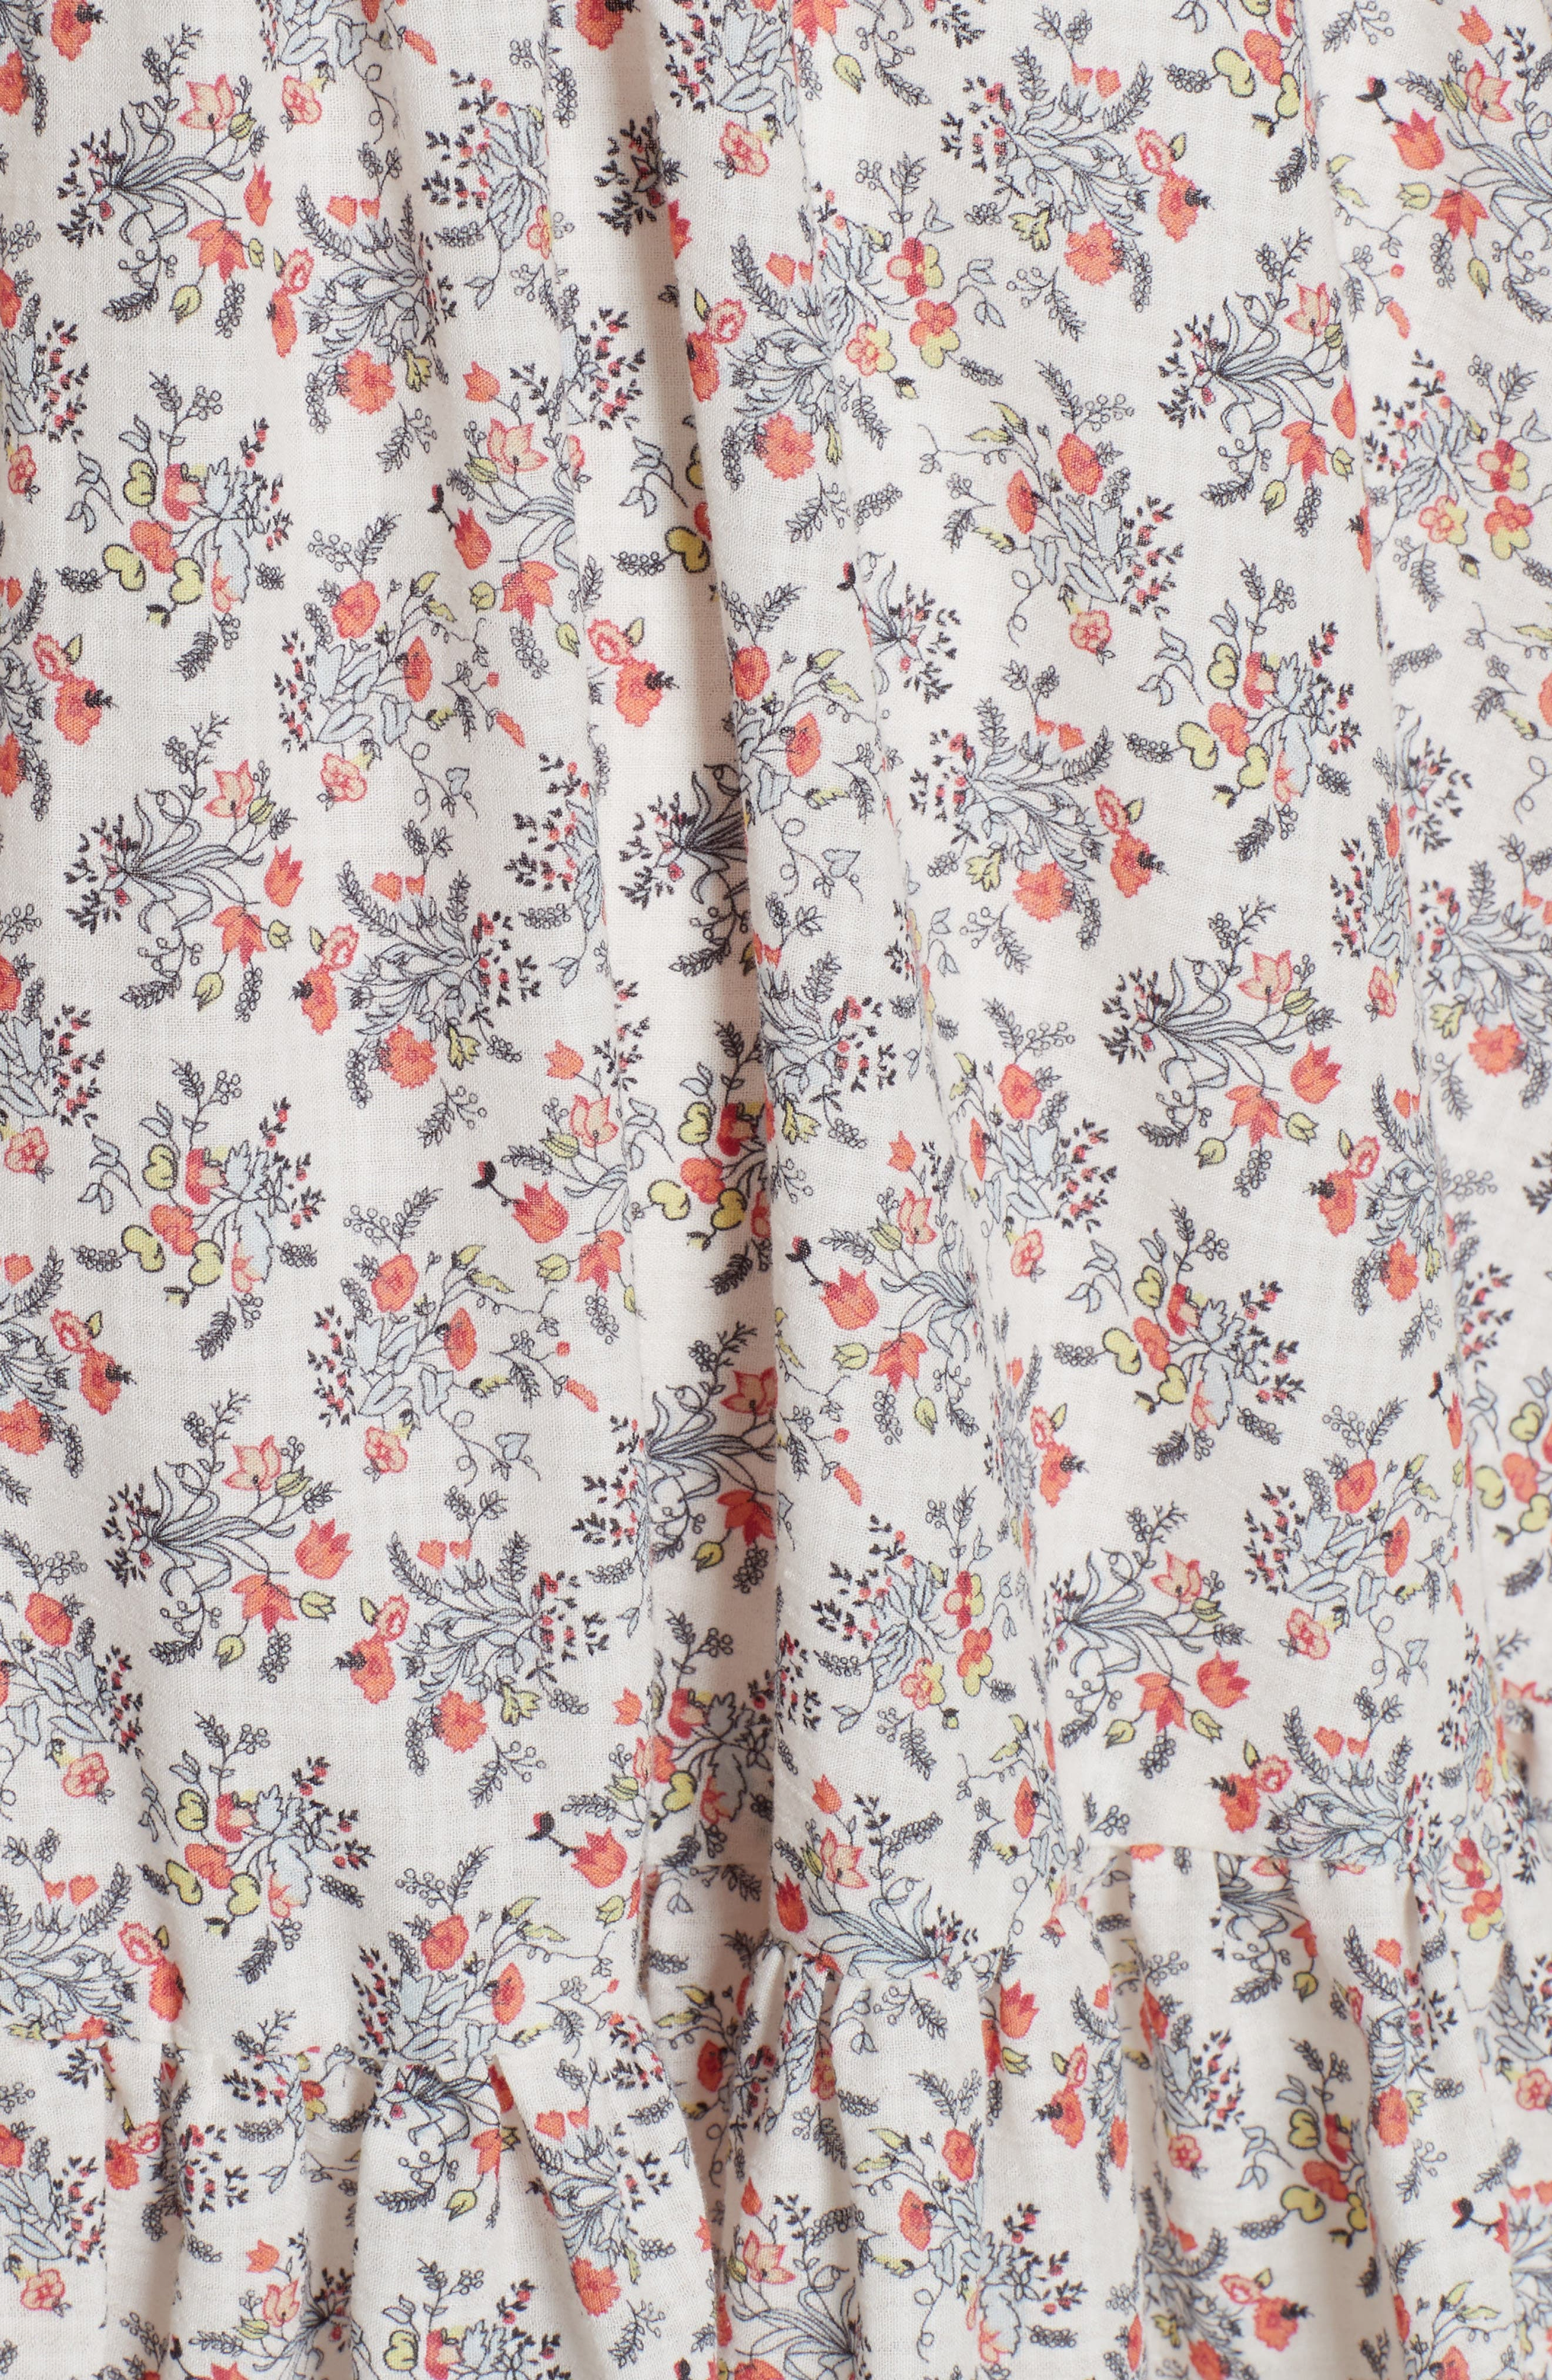 Provençal Strapless Dress,                             Alternate thumbnail 5, color,                             900